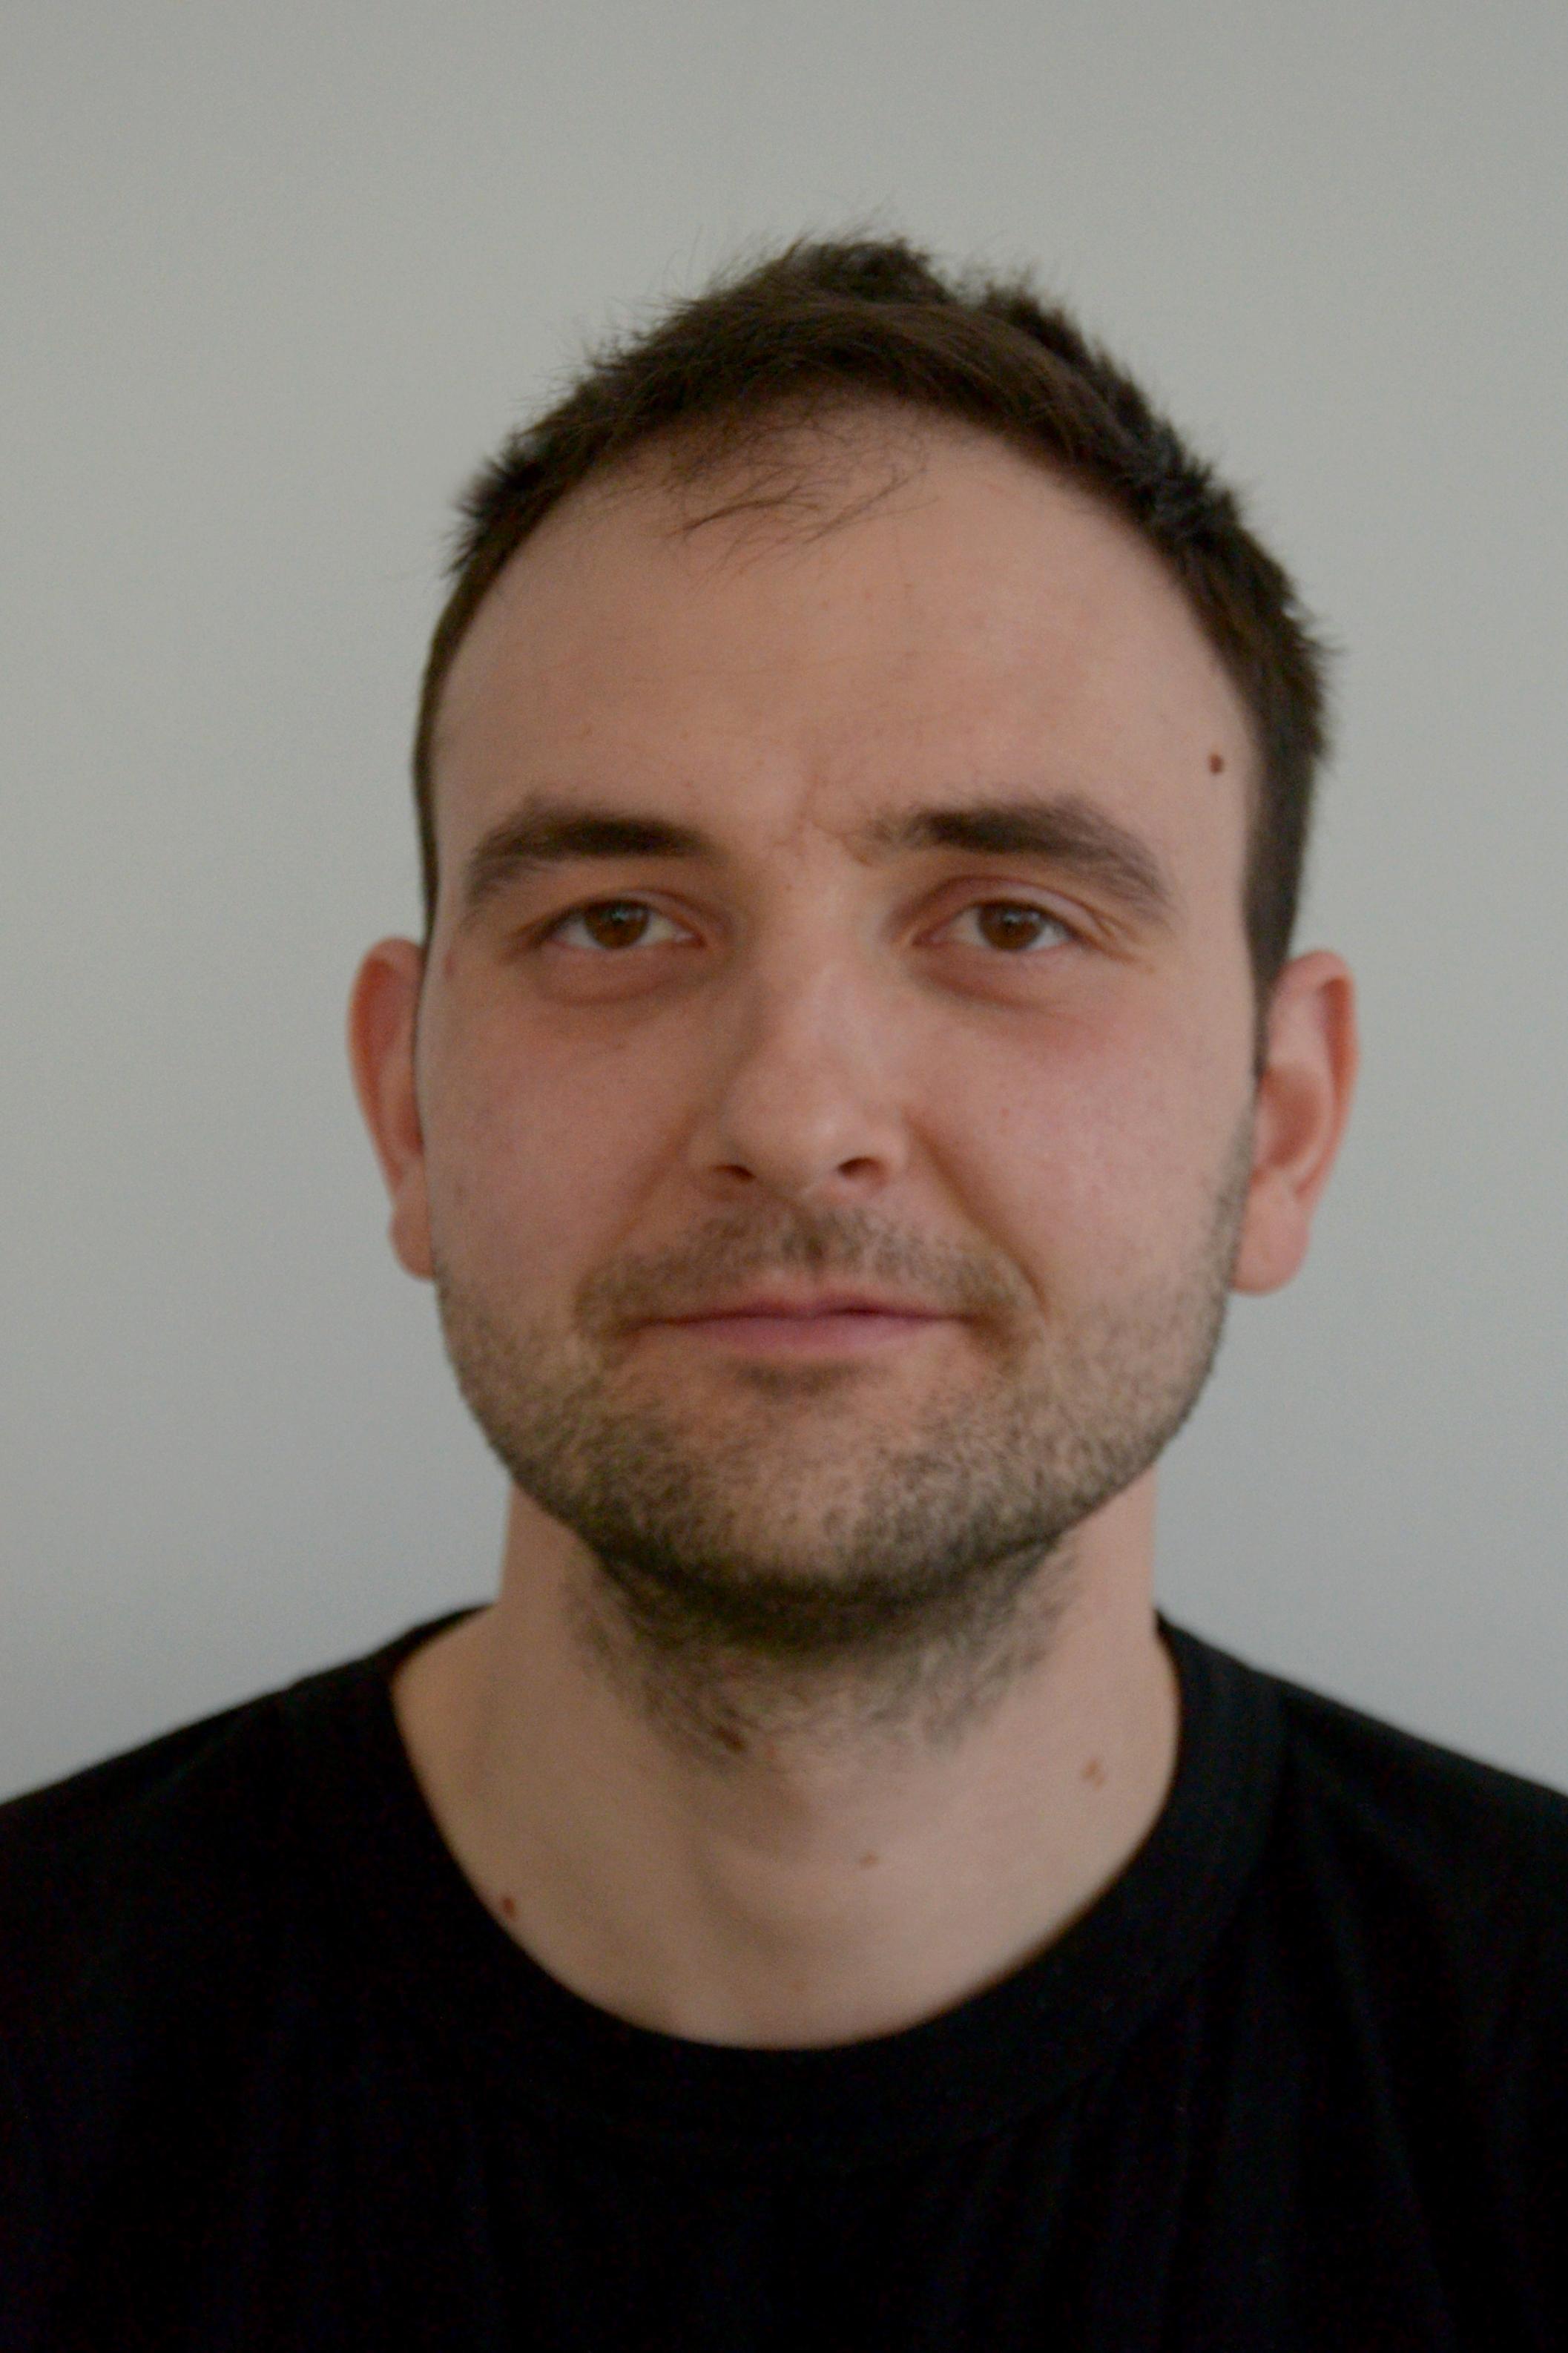 Dimitar Genchev